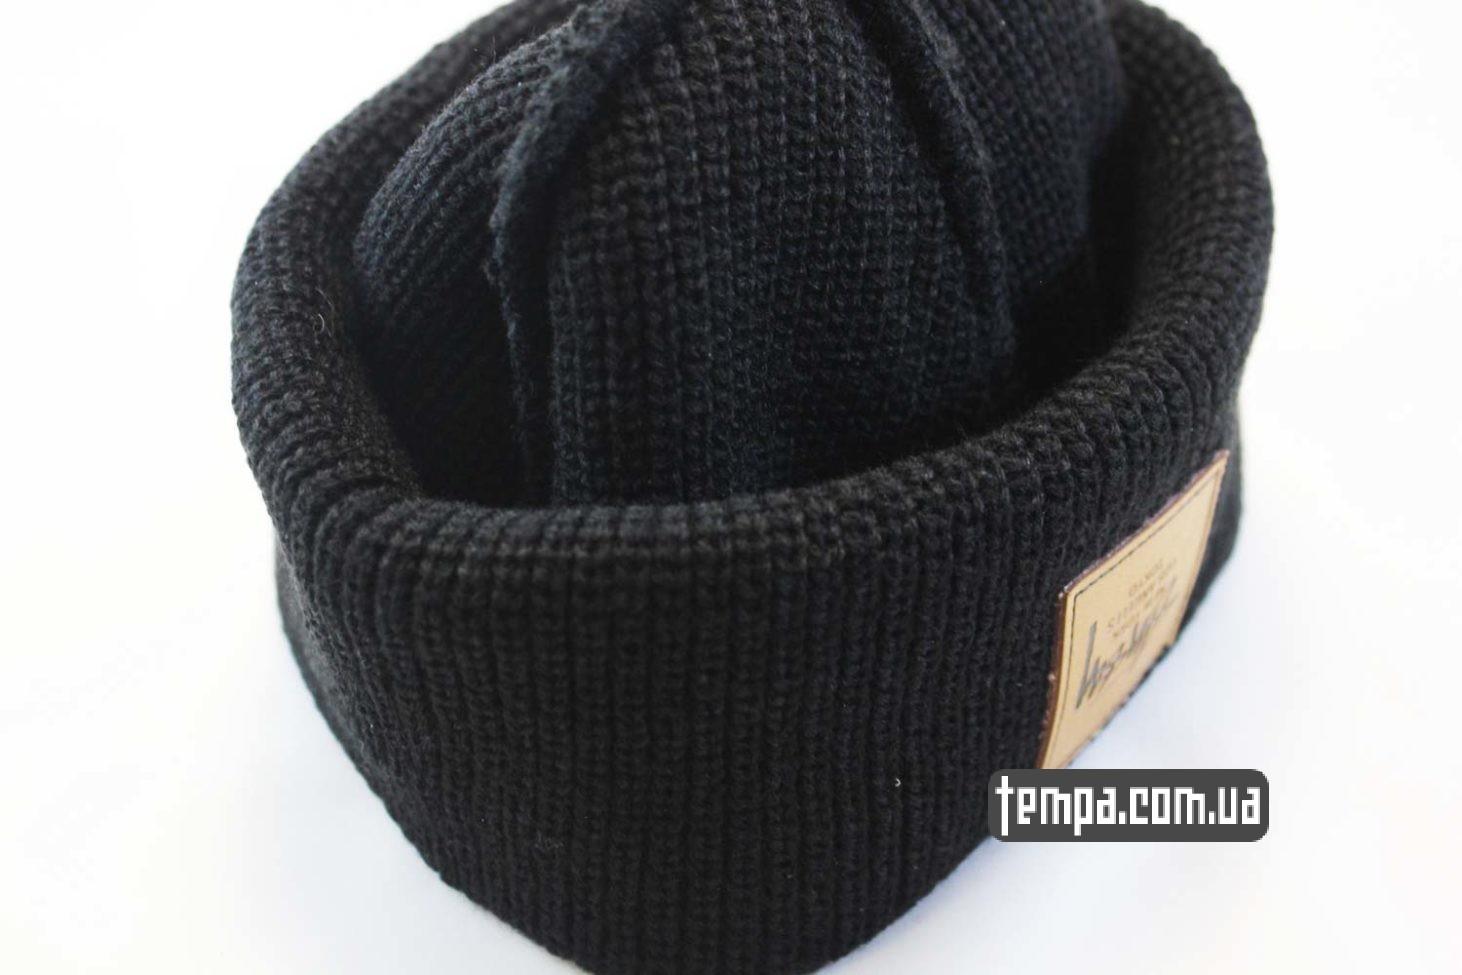 молодежная шапка. шапка beanie STUSSY New York Los Angeles Tokyo купить магазин Украина